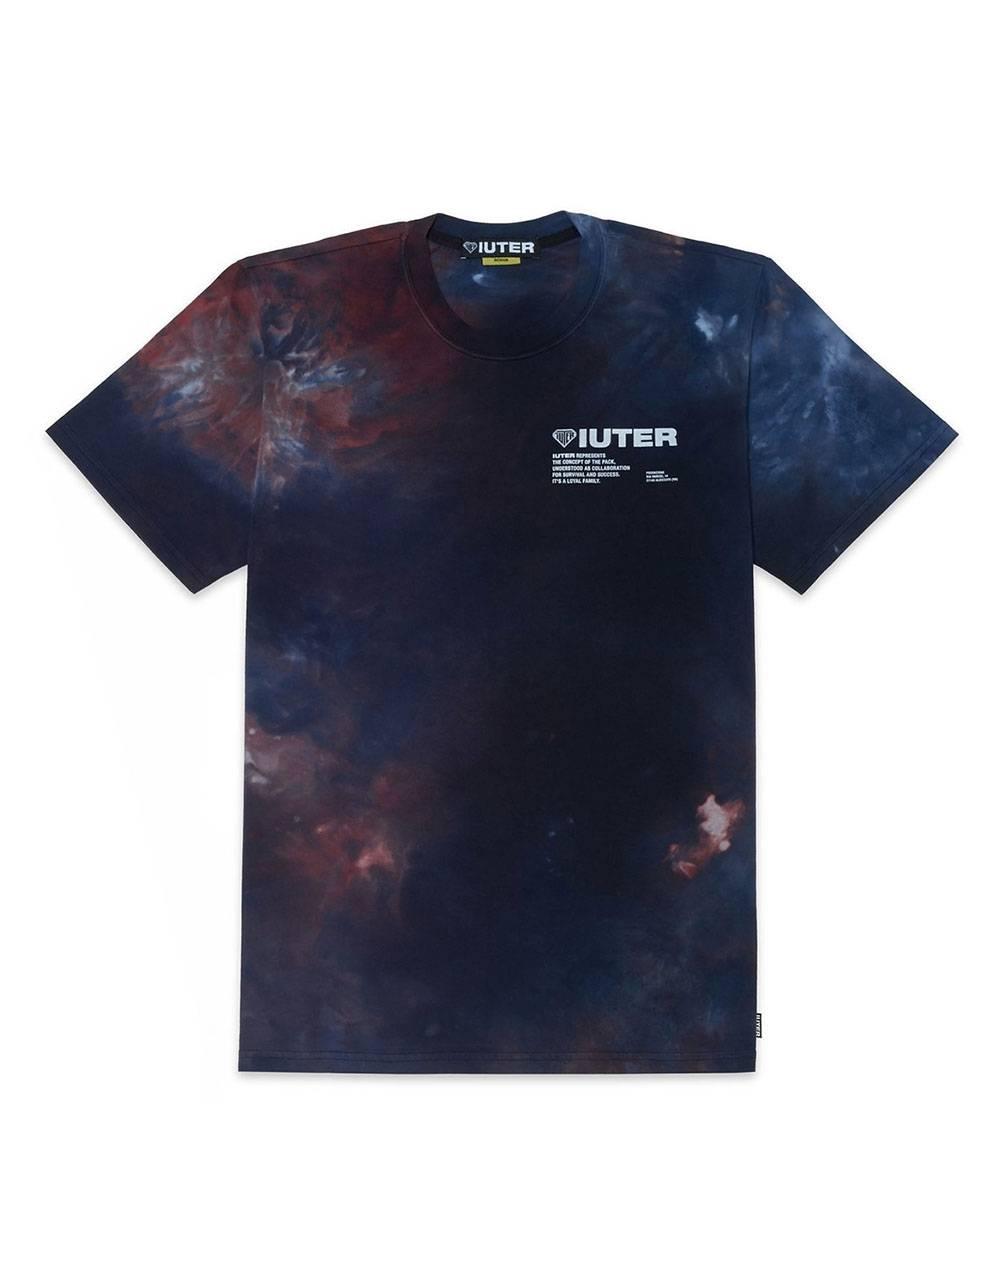 Iuter Disaster tee - Multicolor IUTER T-shirt 40,98€